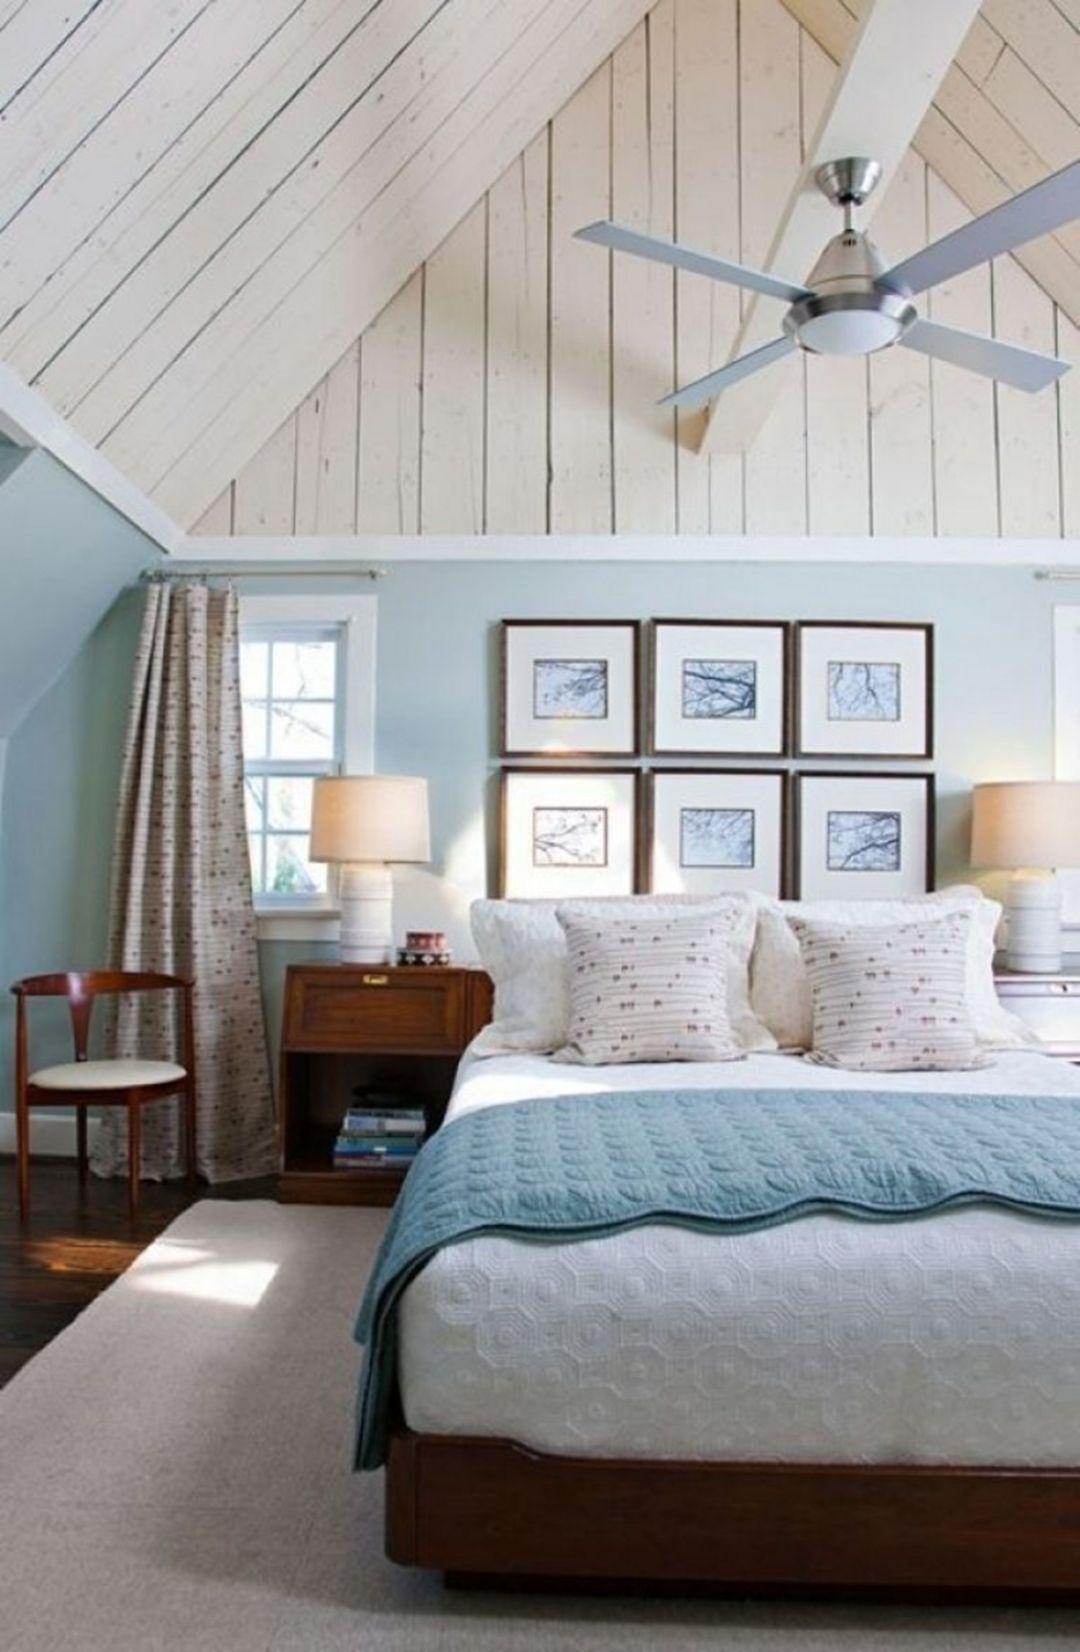 15 Amazing Coastal Bedroom Decorating Ideas For